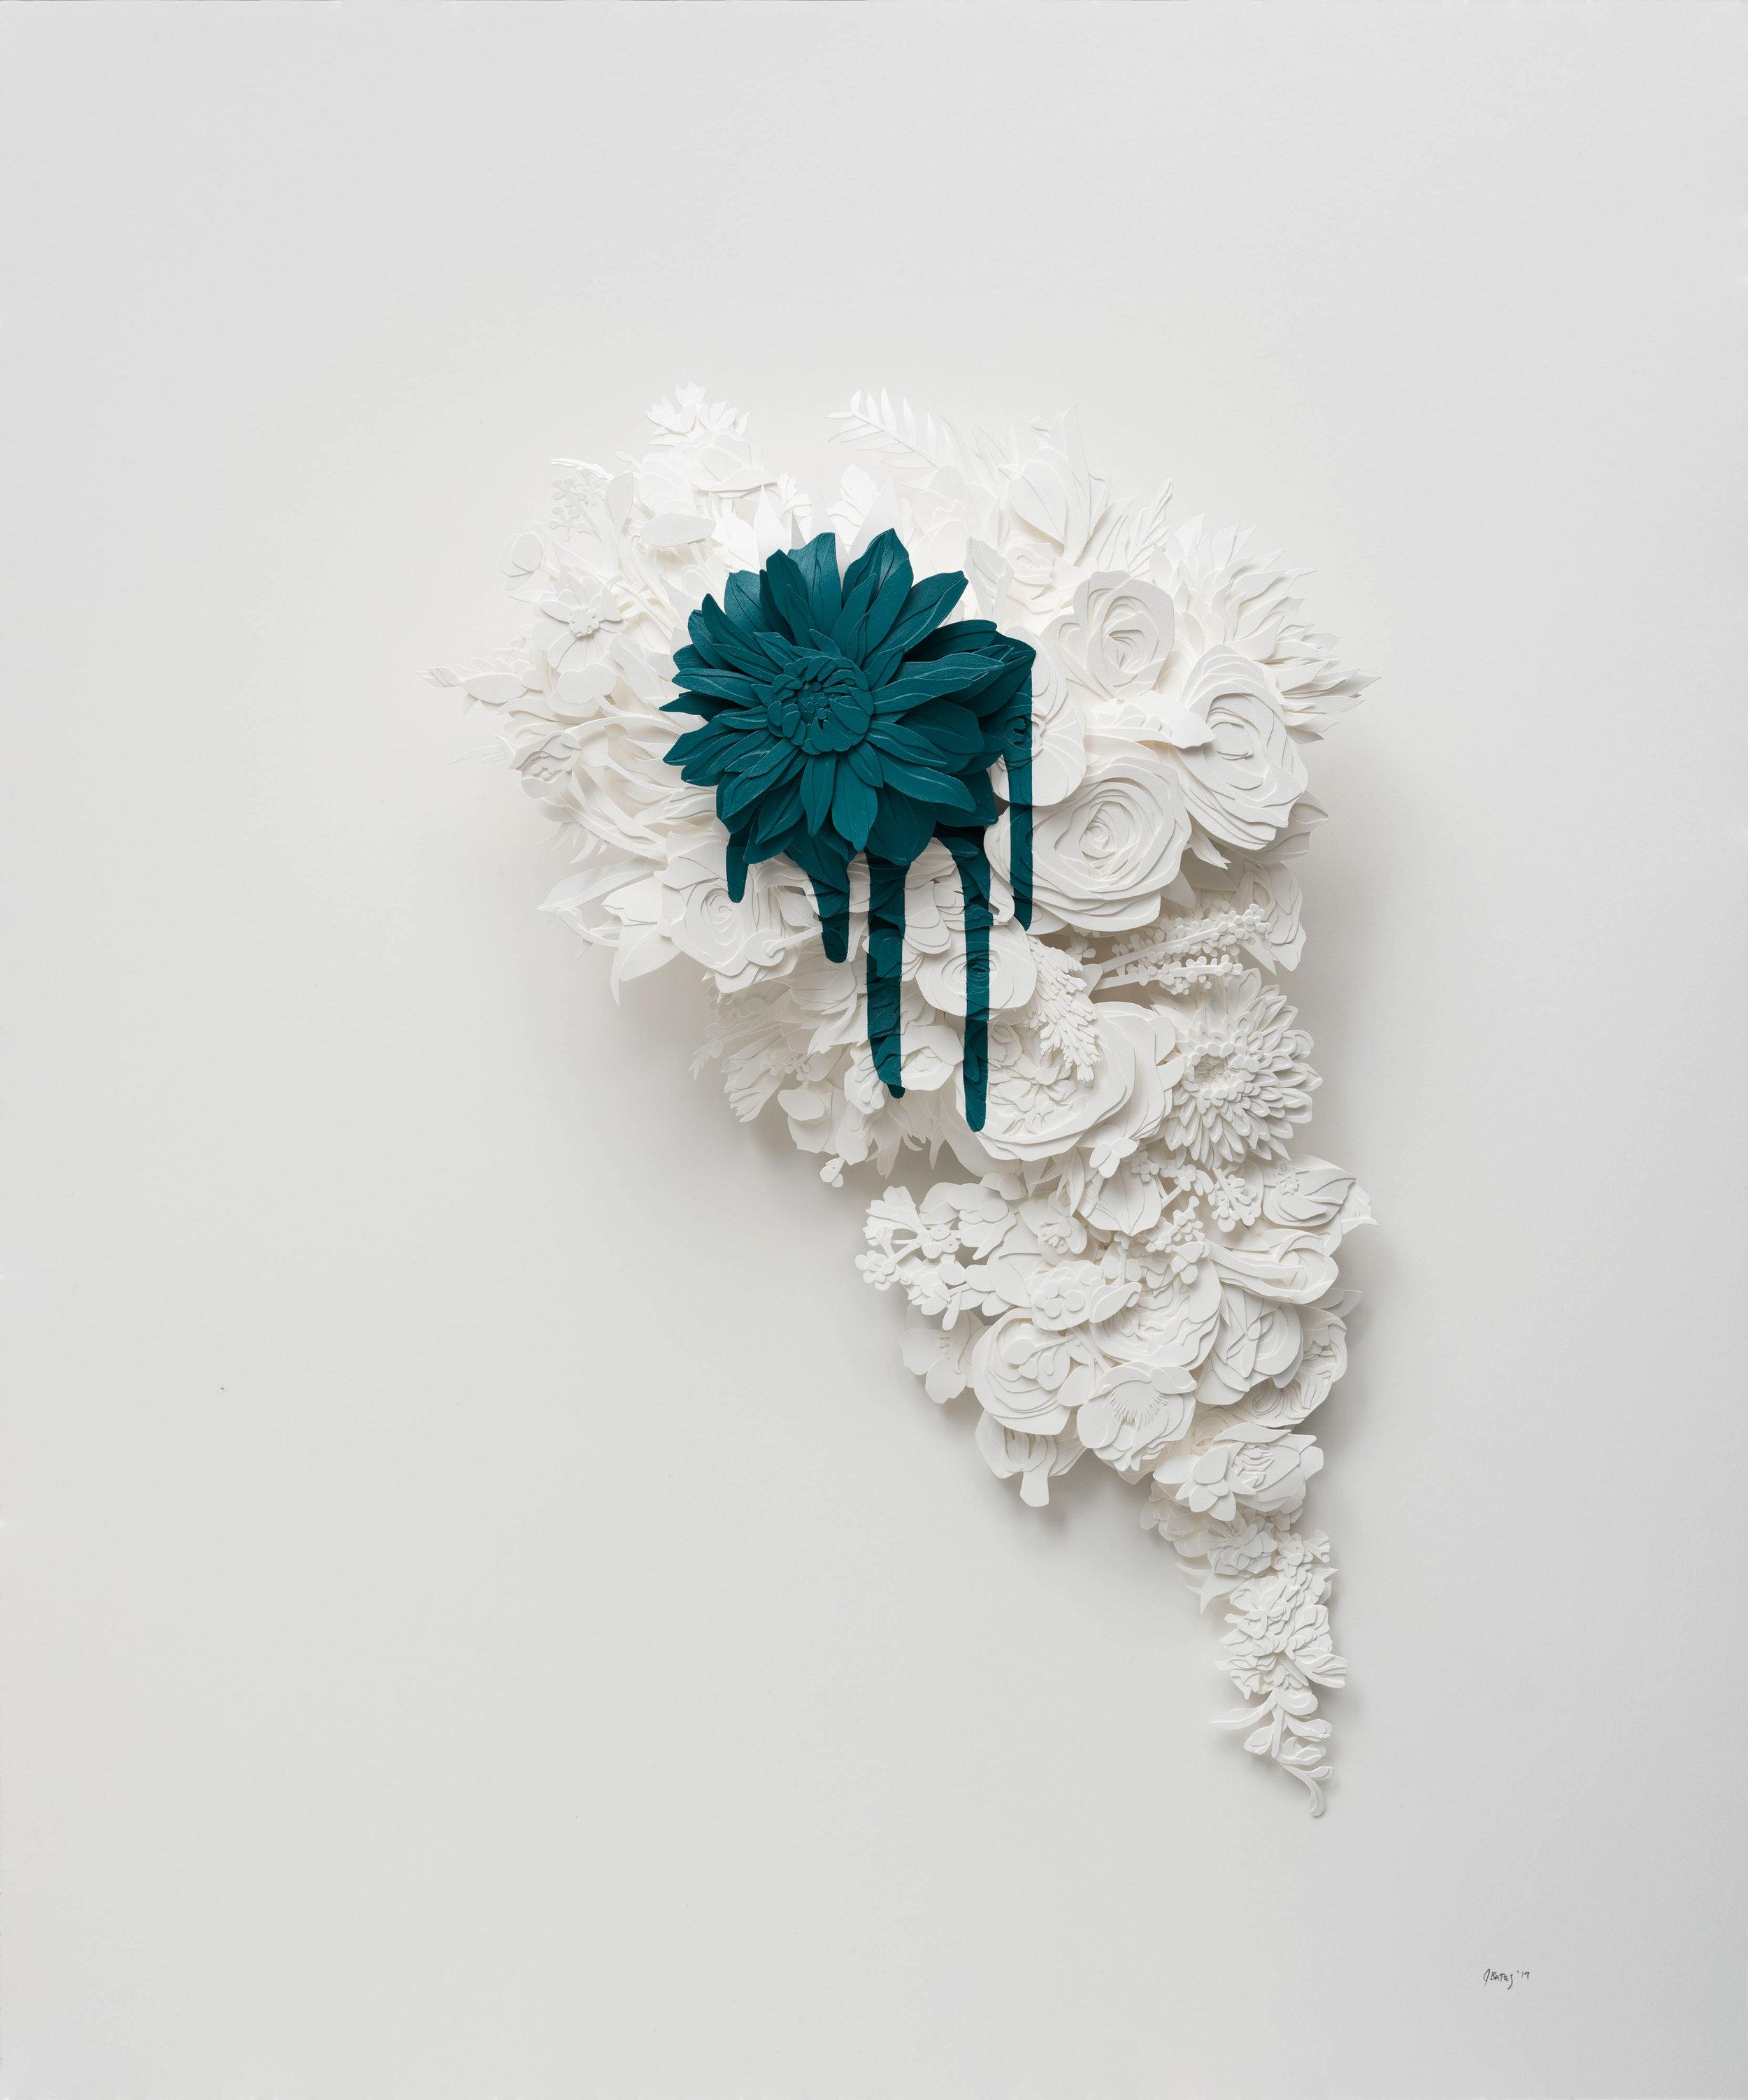 Bleed in Cobalt Turquoise